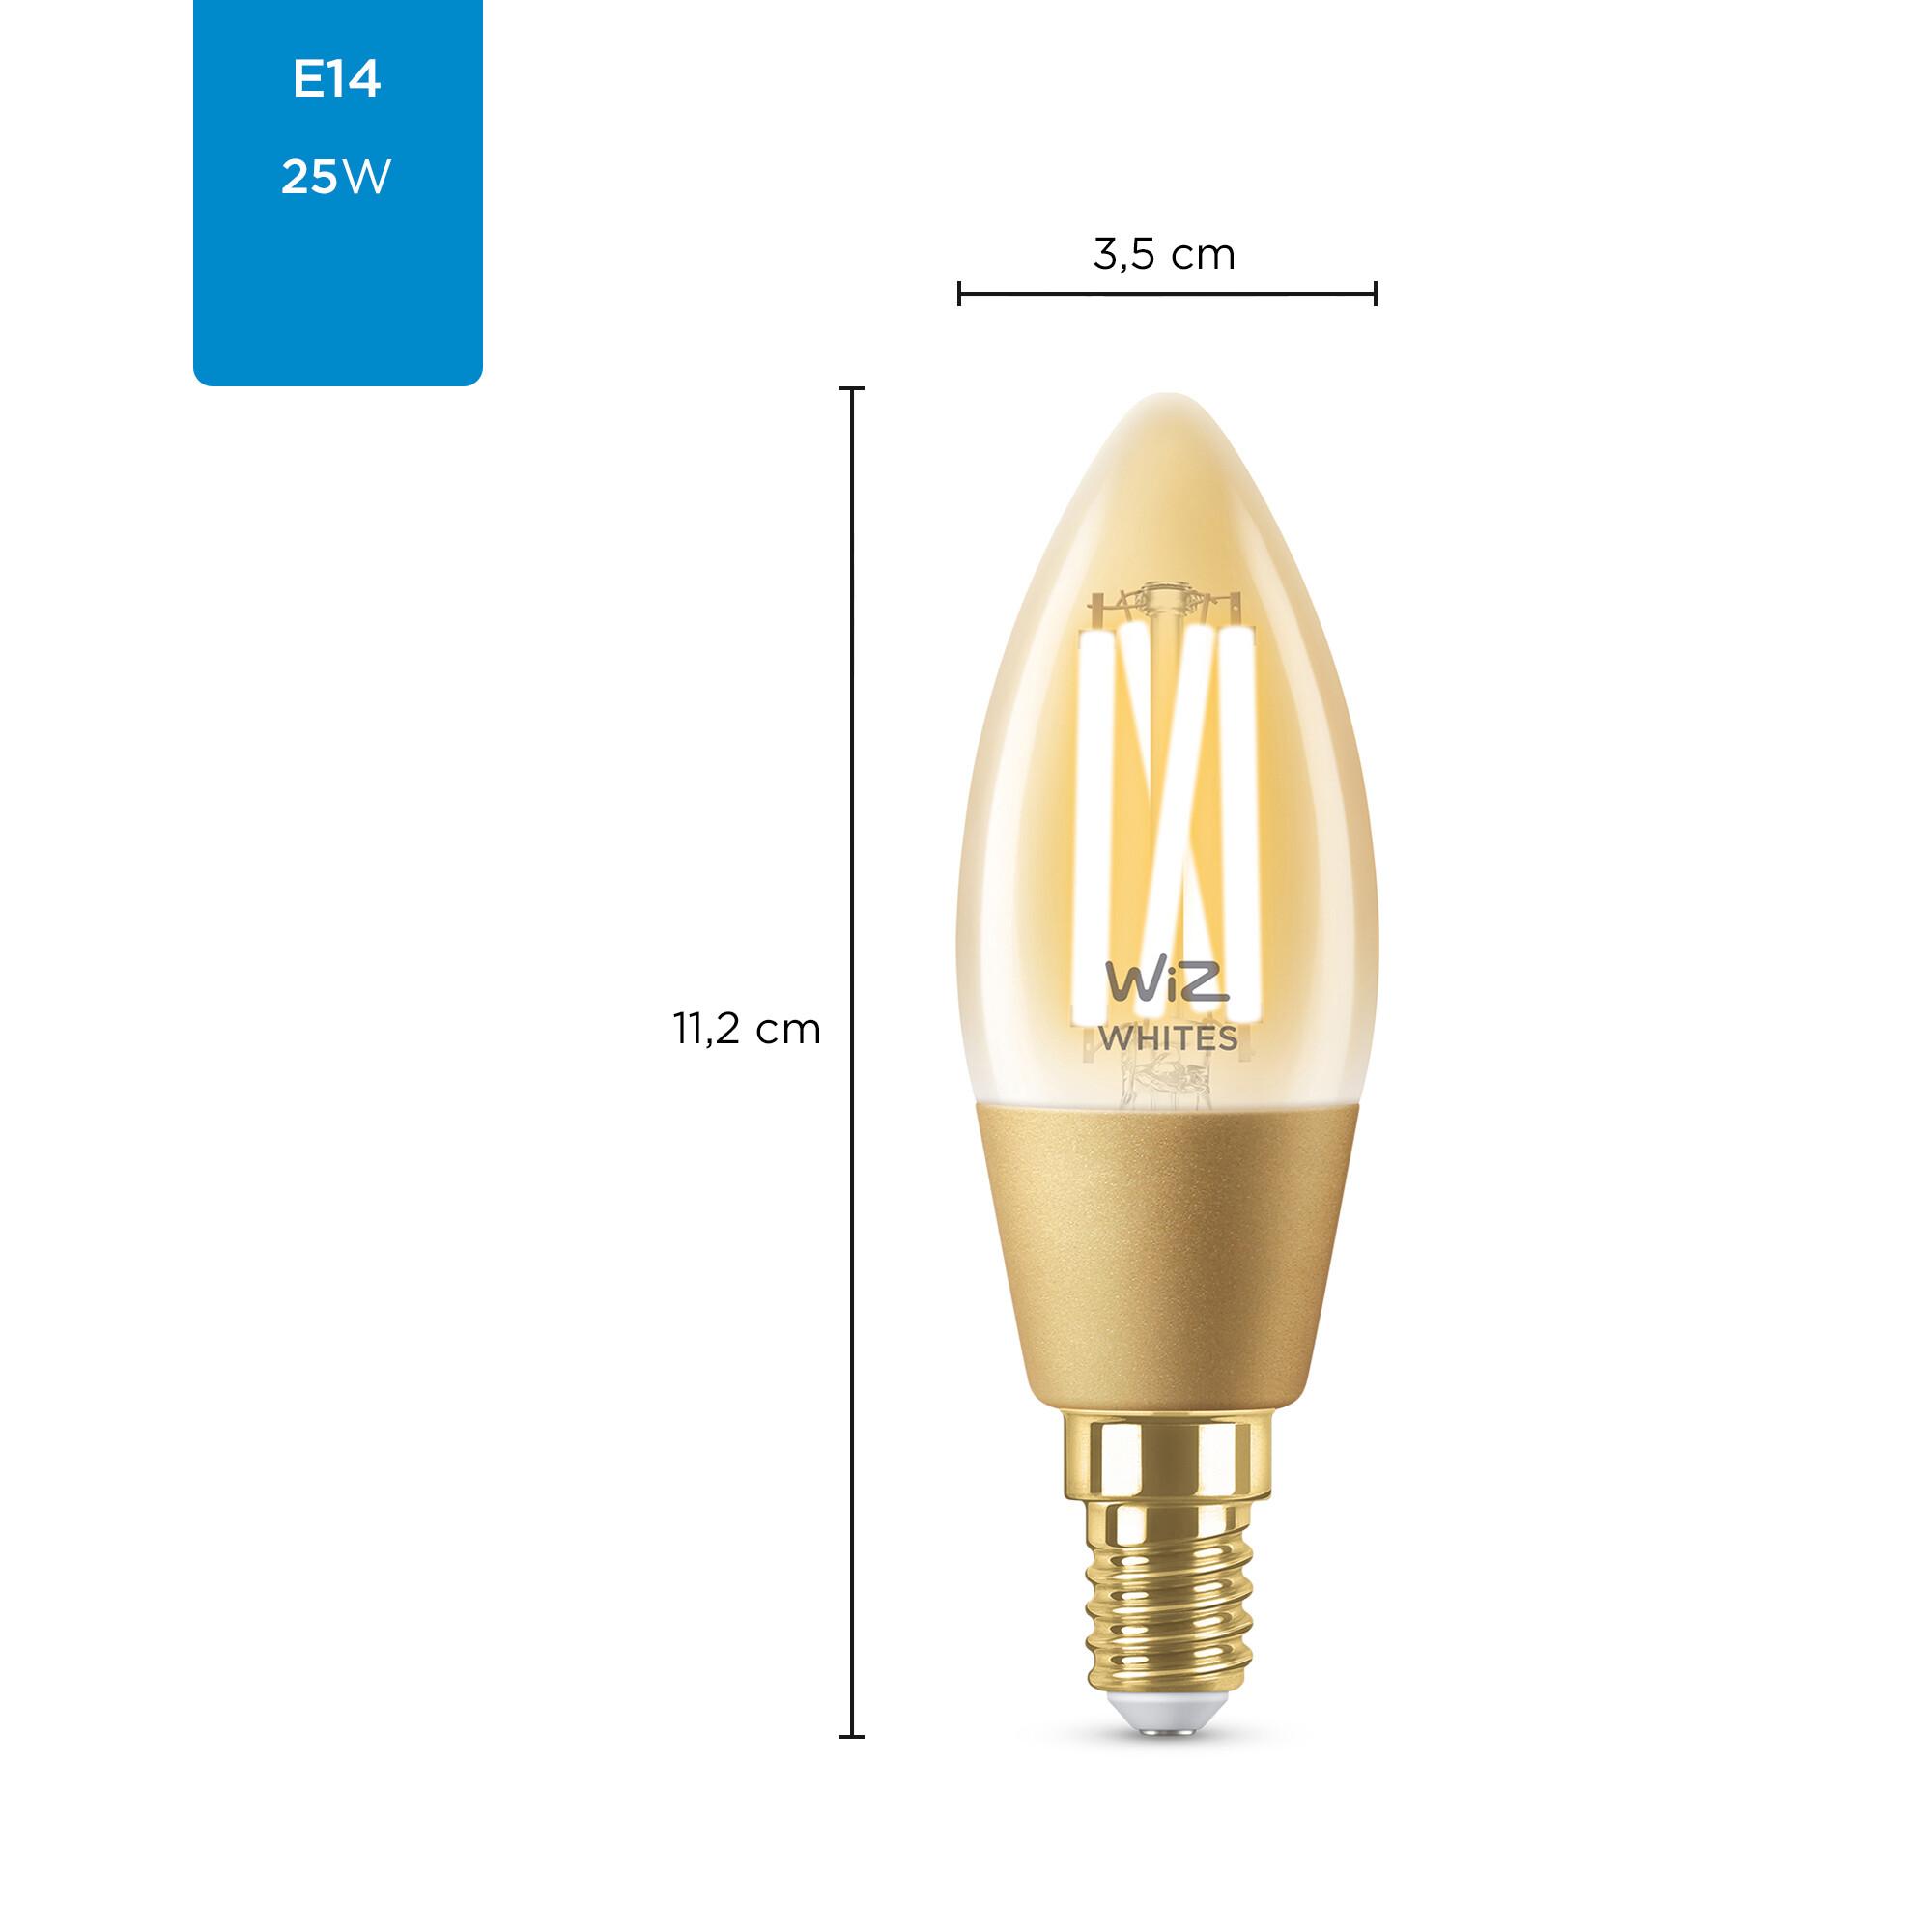 WiZ E14 25W 370lm 2000K Kaars Gouden coating